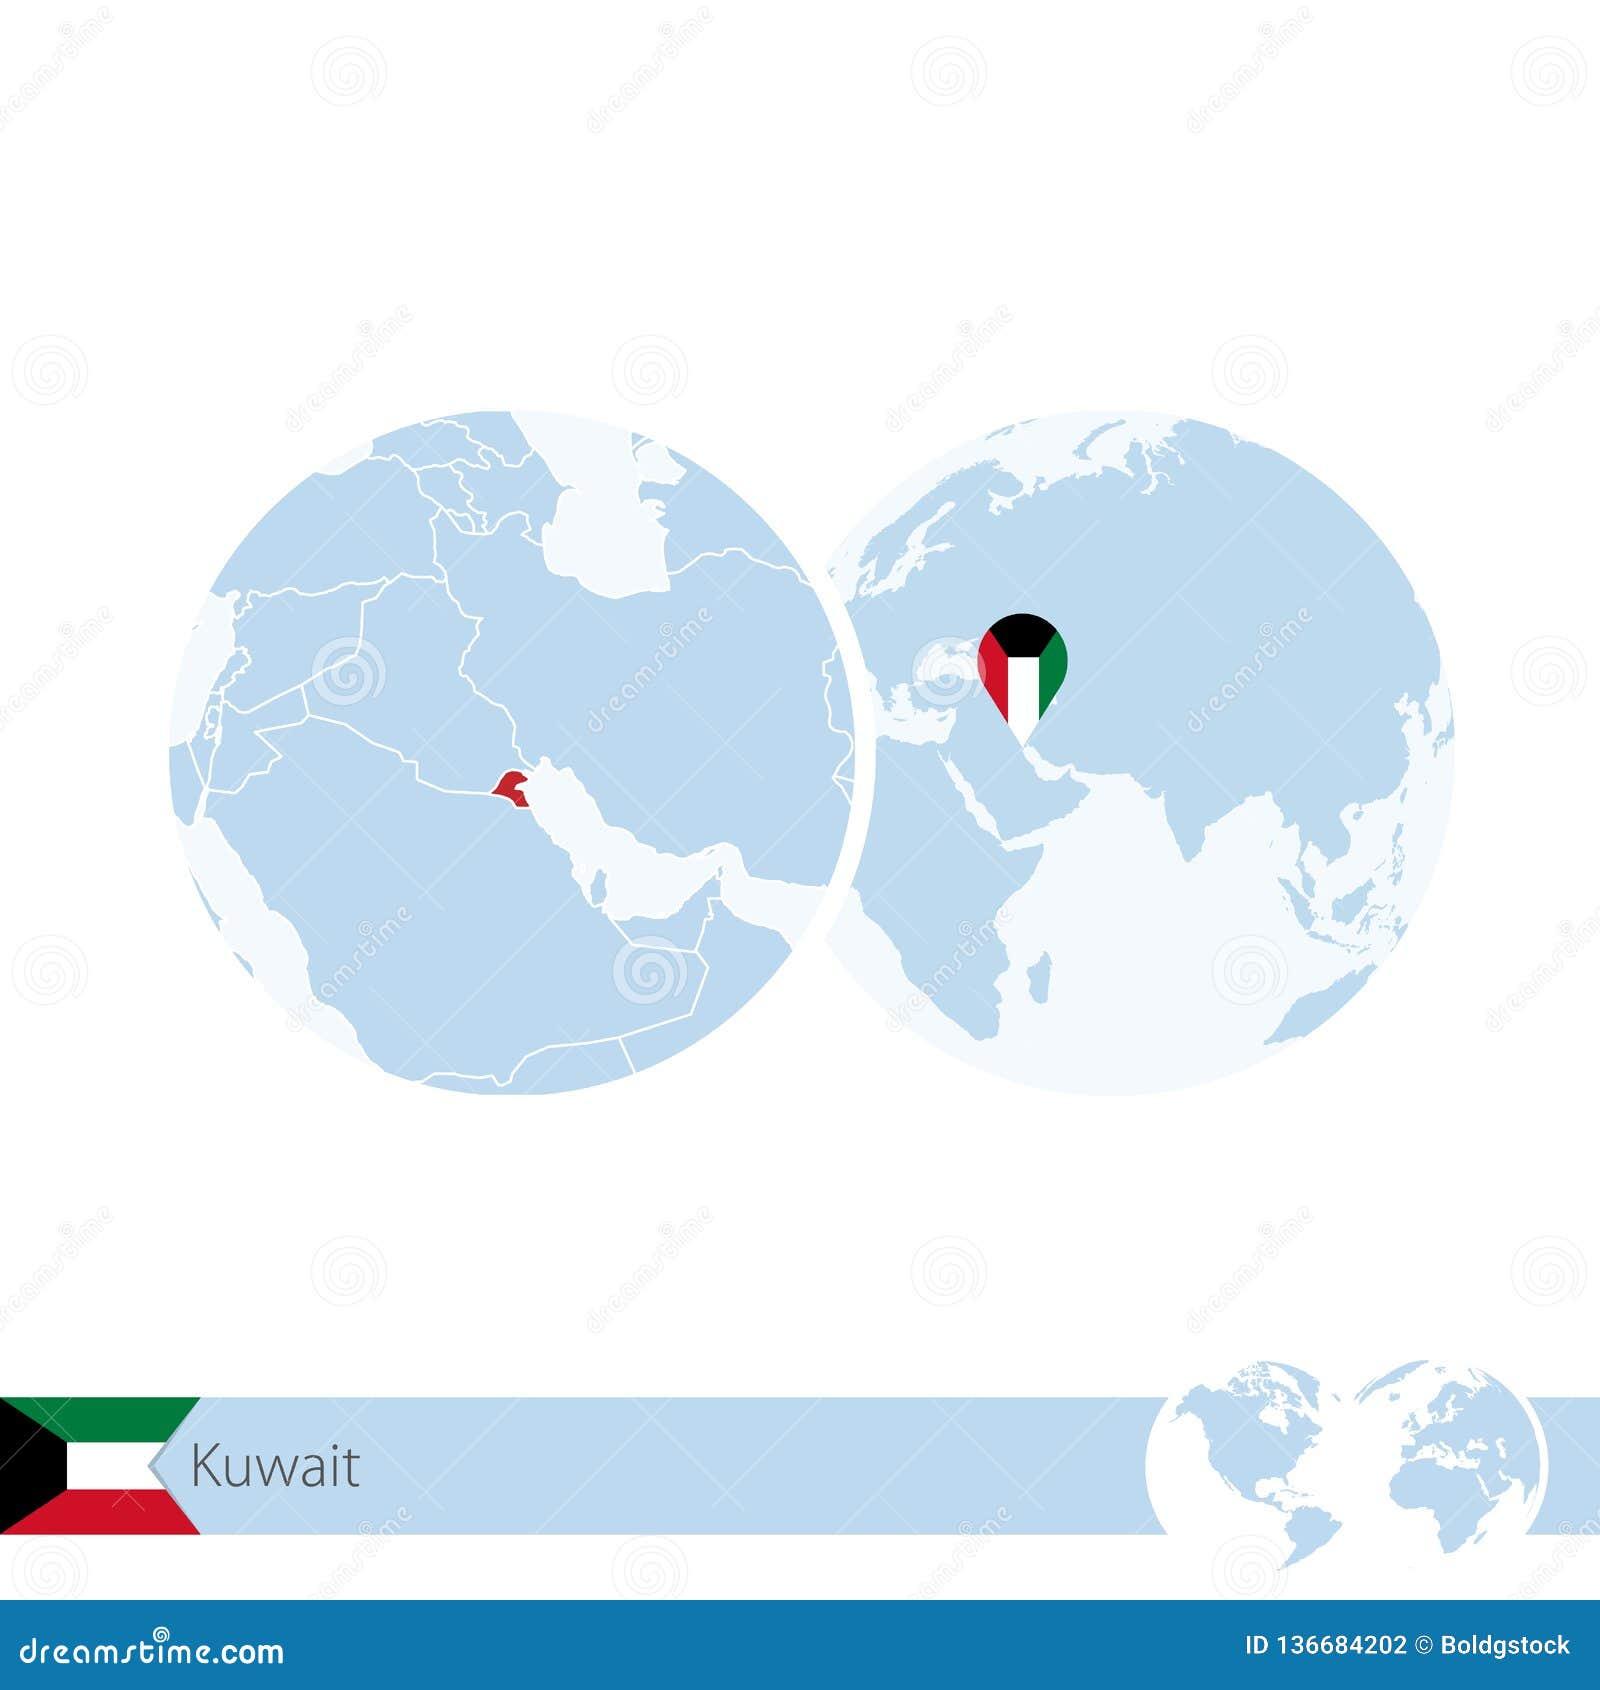 Kuwait On World Globe With Flag And Regional Map Of Kuwait ...